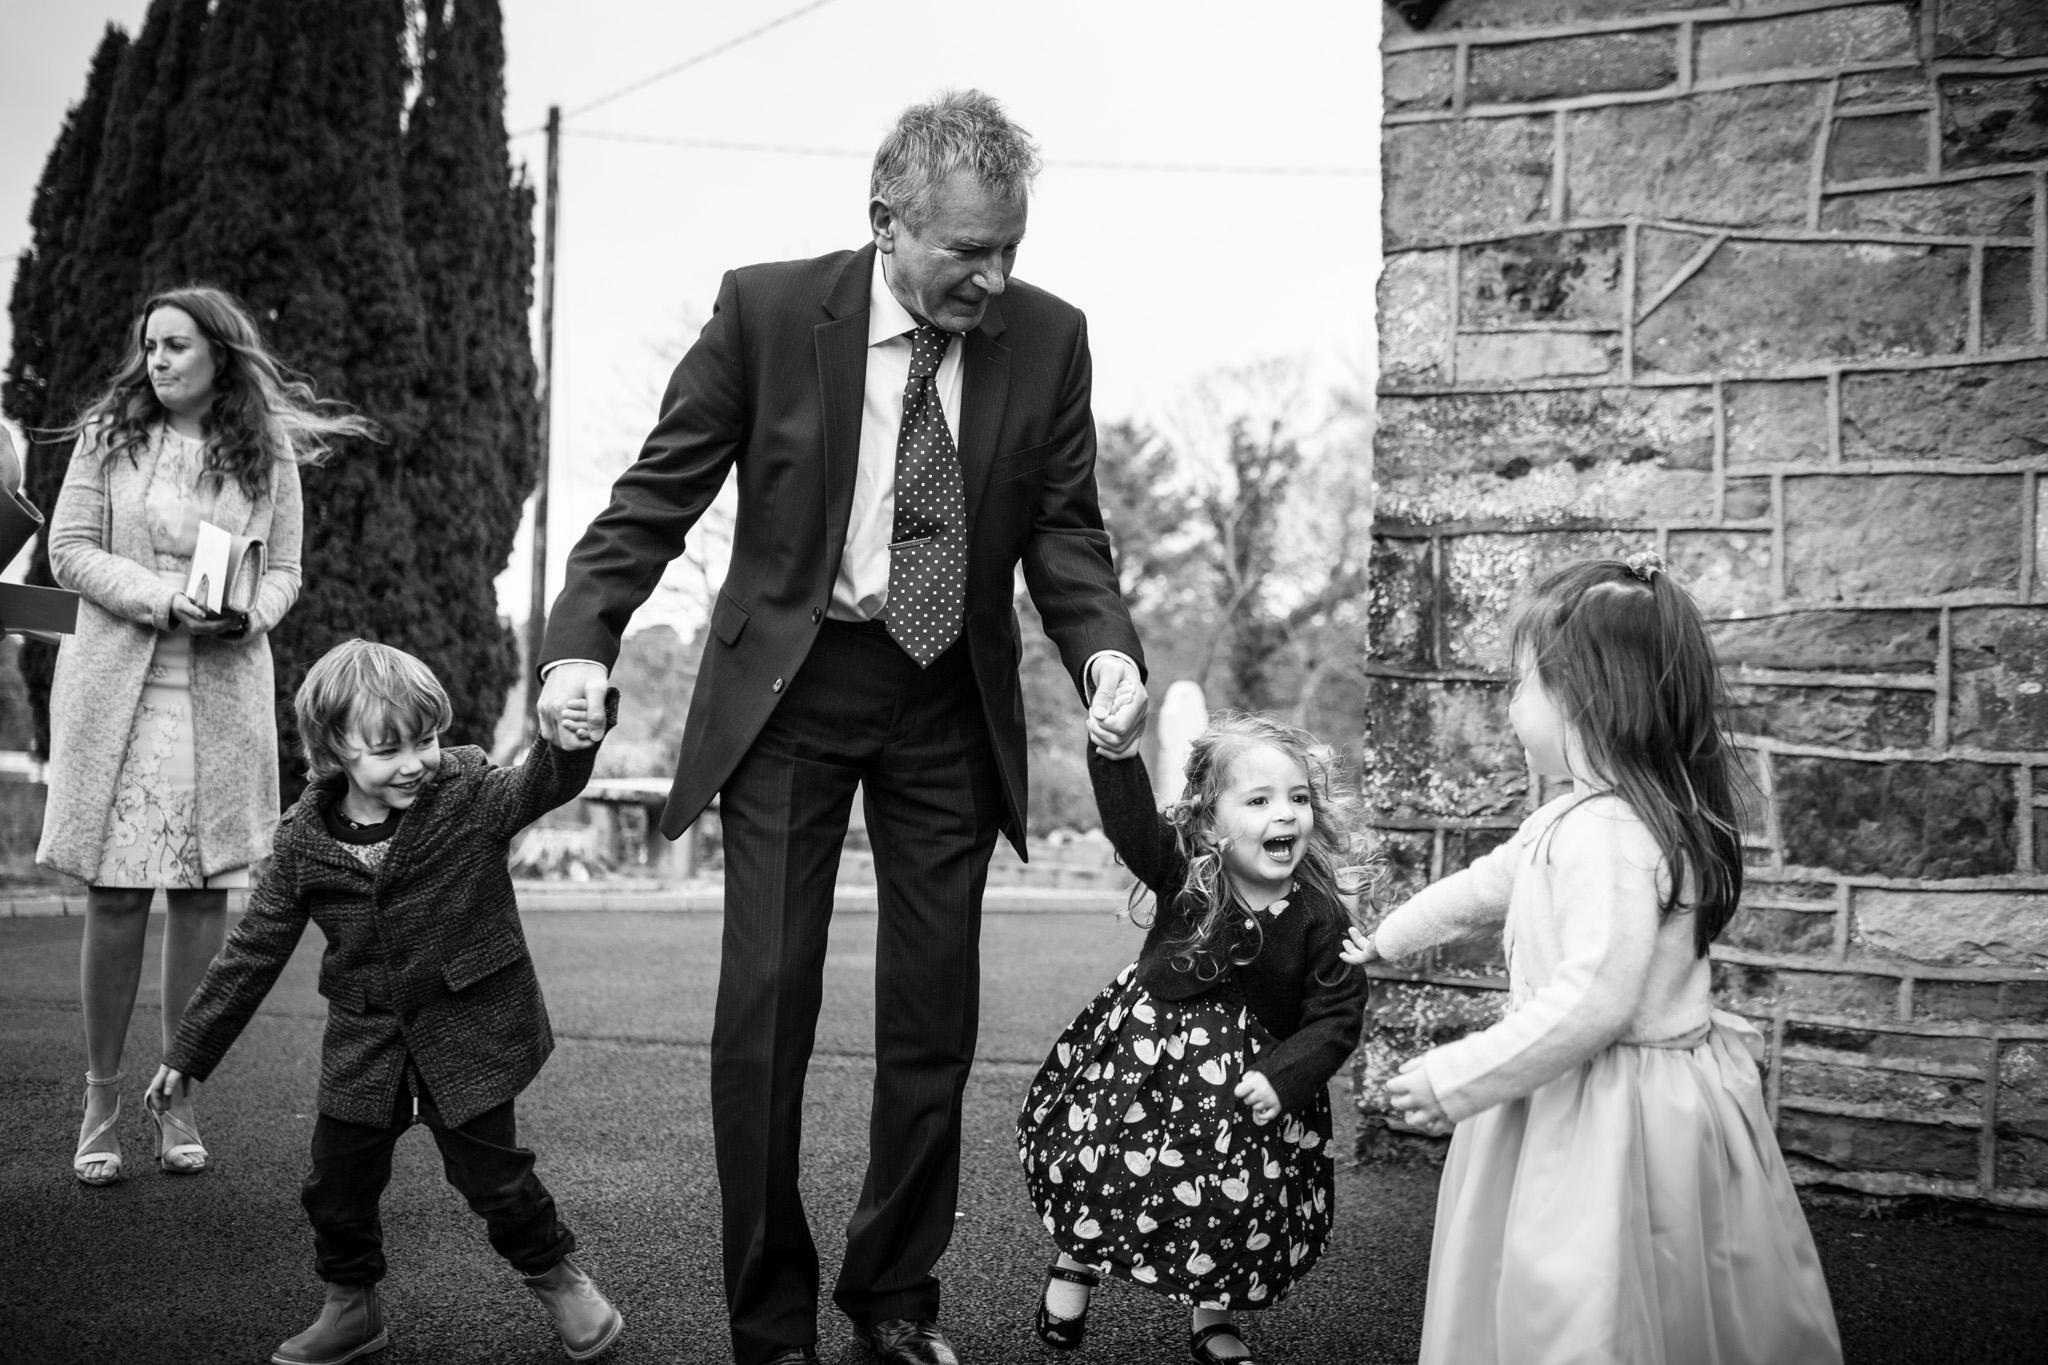 Mark_Barnes_Northern_Ireland_wedding_photographer_Harveys_Point_Donegall_Wedding_photography-Adam&Gemma-29.jpg